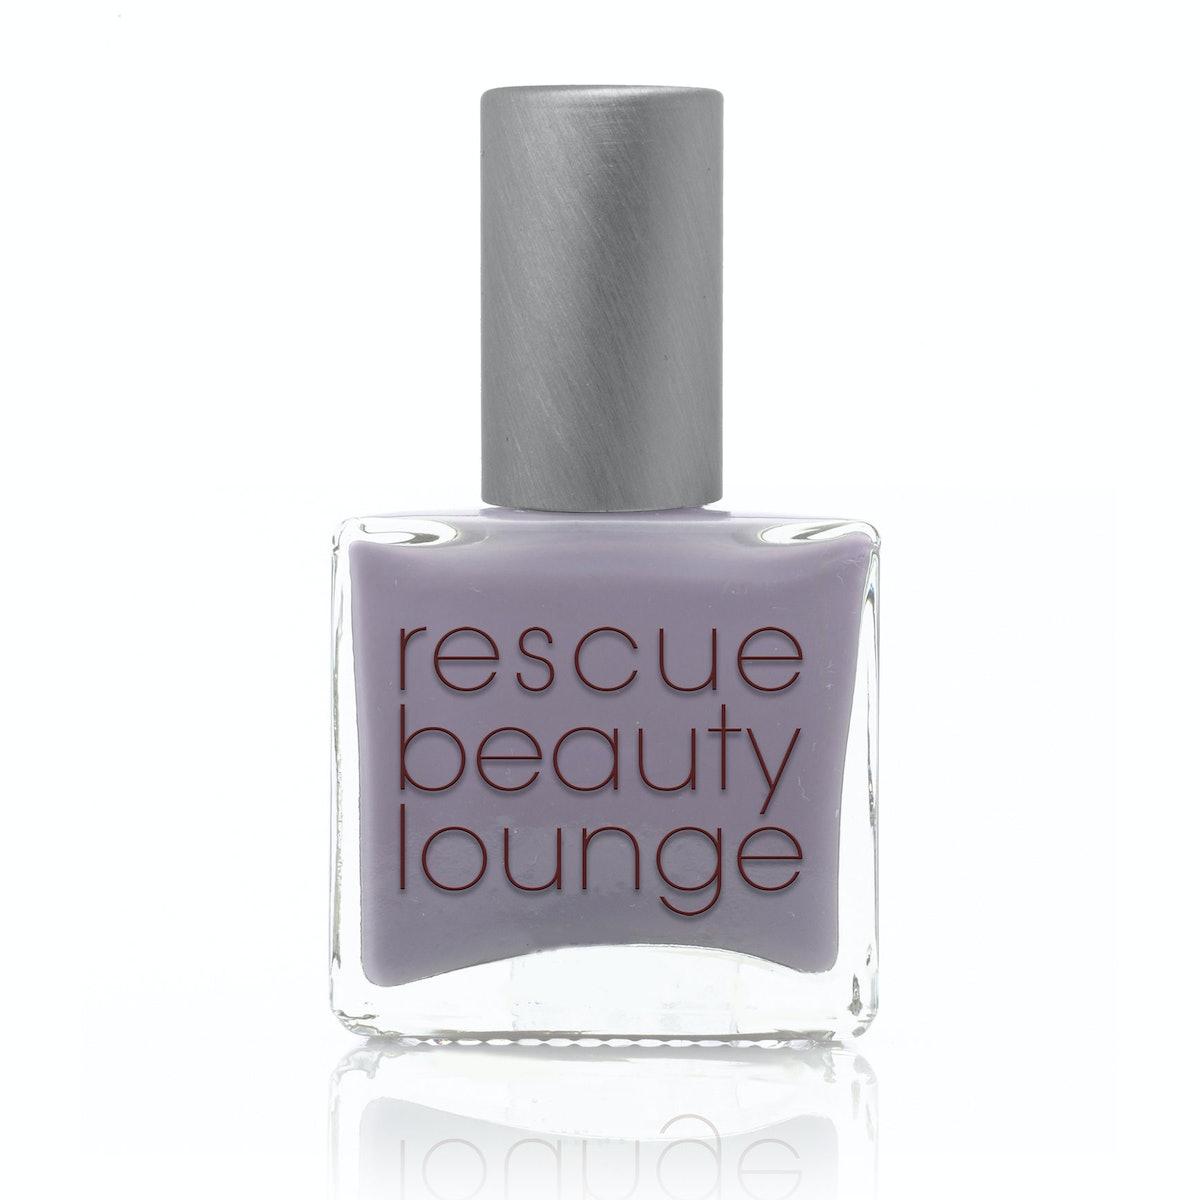 Rescue Beauty Lounge nail polish in Forgiveness